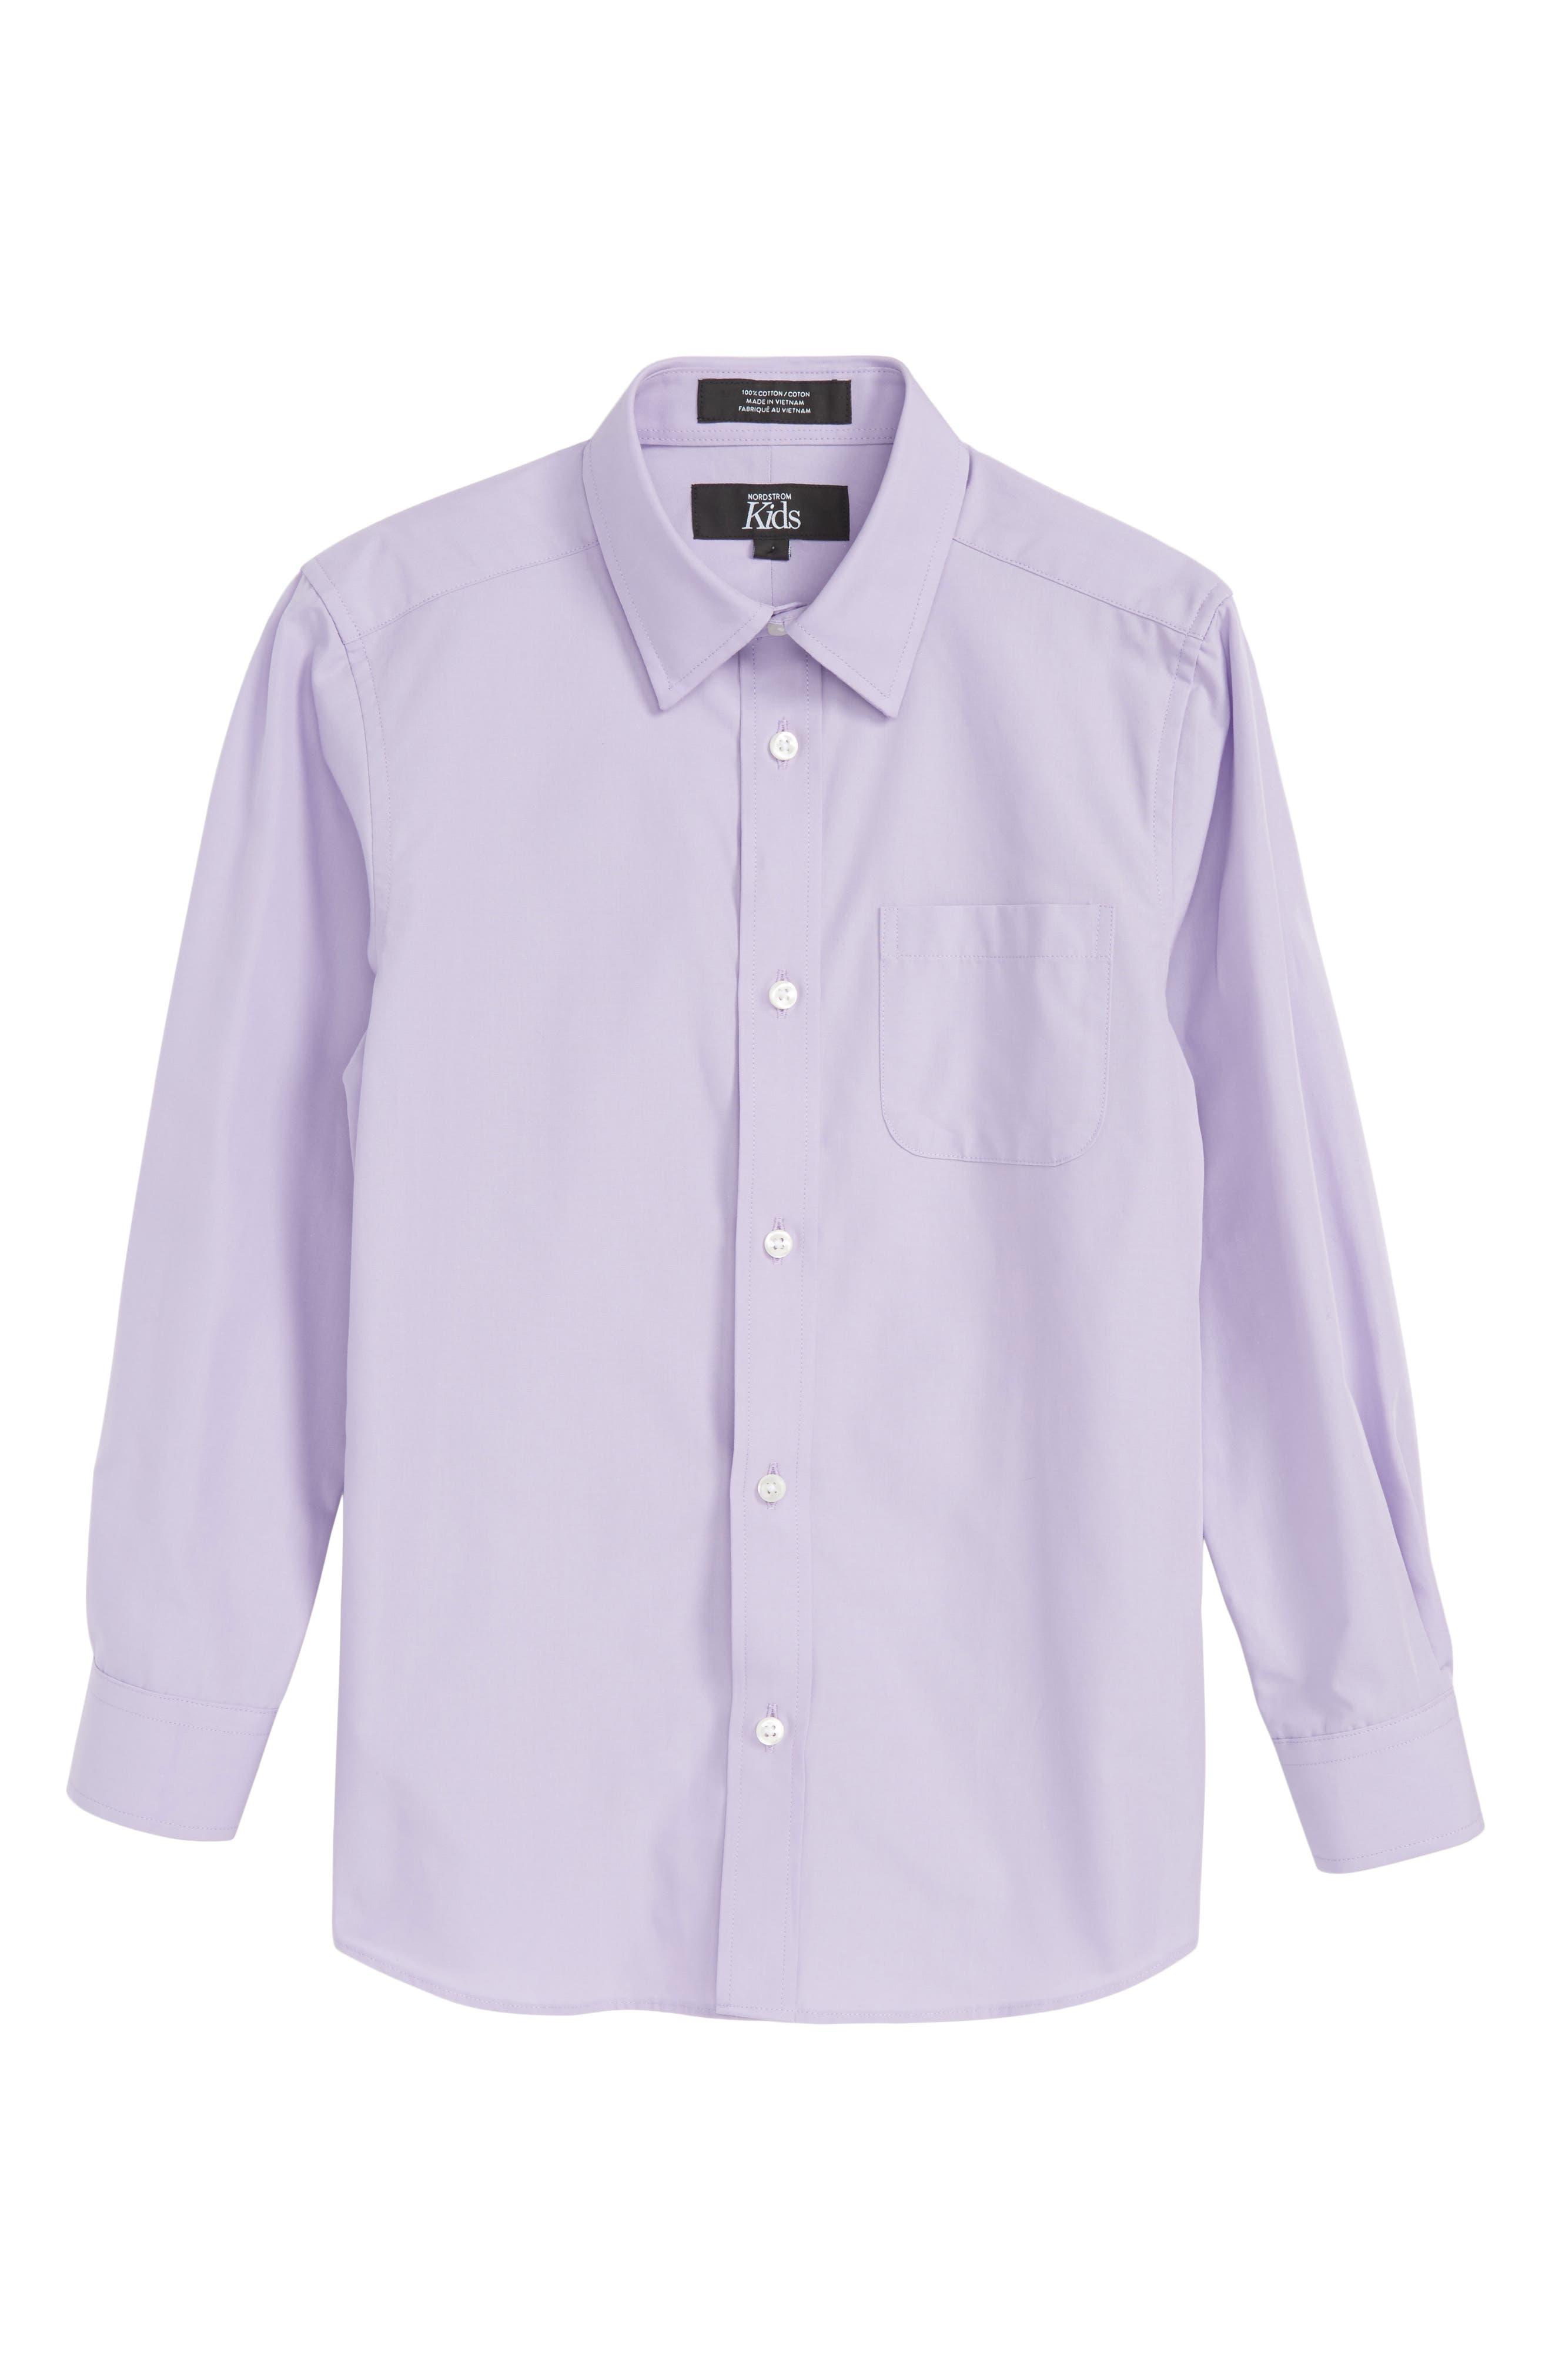 Lavender Spray Sport Shirt,                             Main thumbnail 1, color,                             530